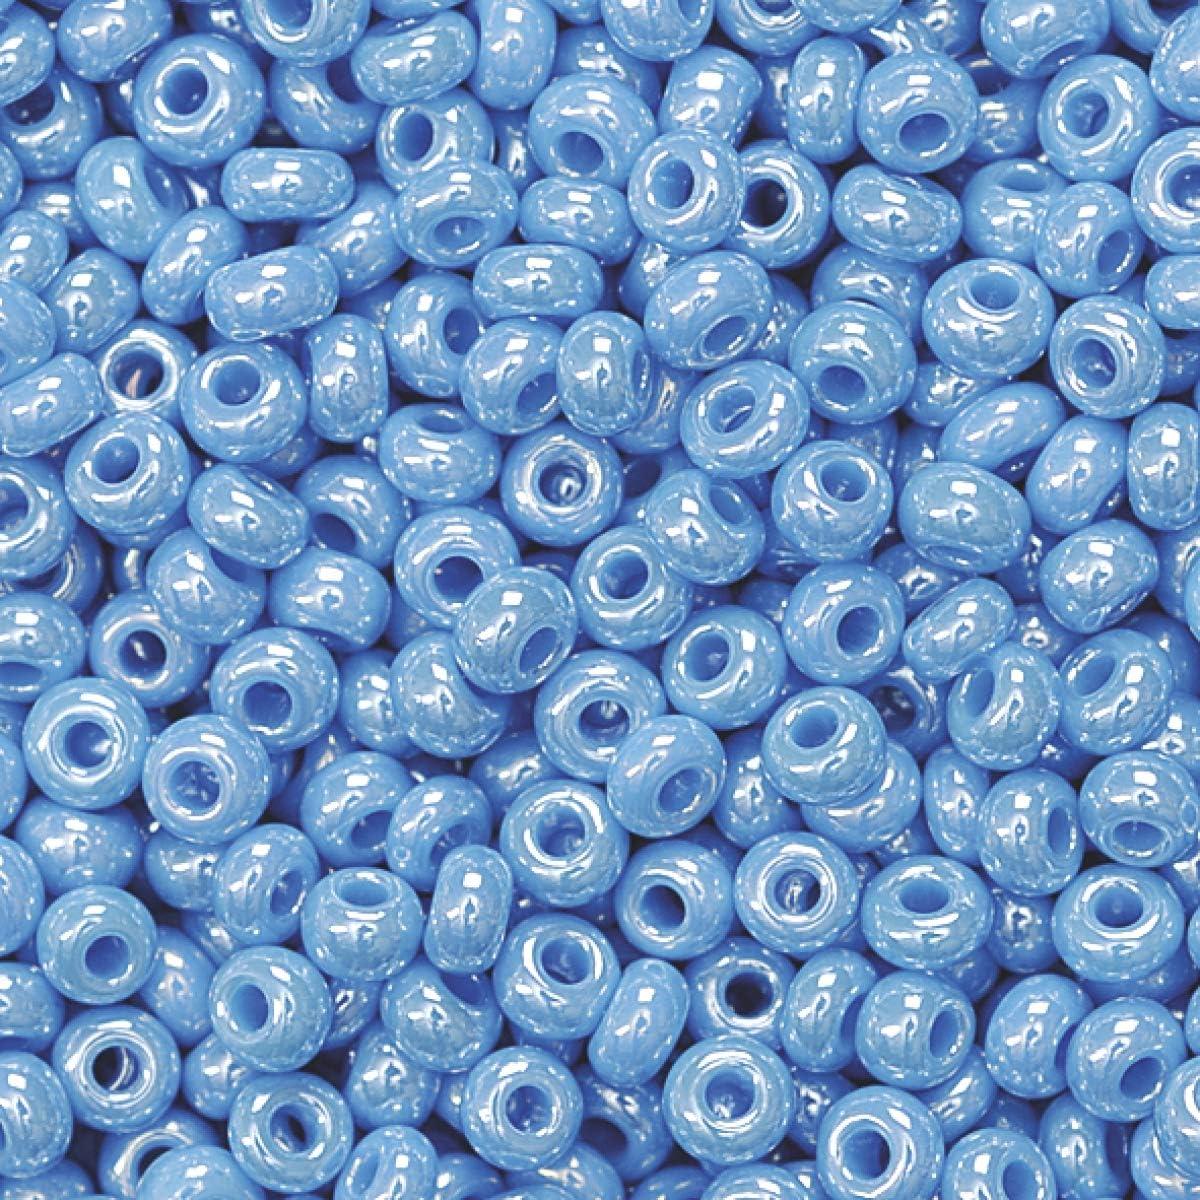 2.5 mm Durchmesser himmelblau KnorrPrandell 3104346 Rocailles